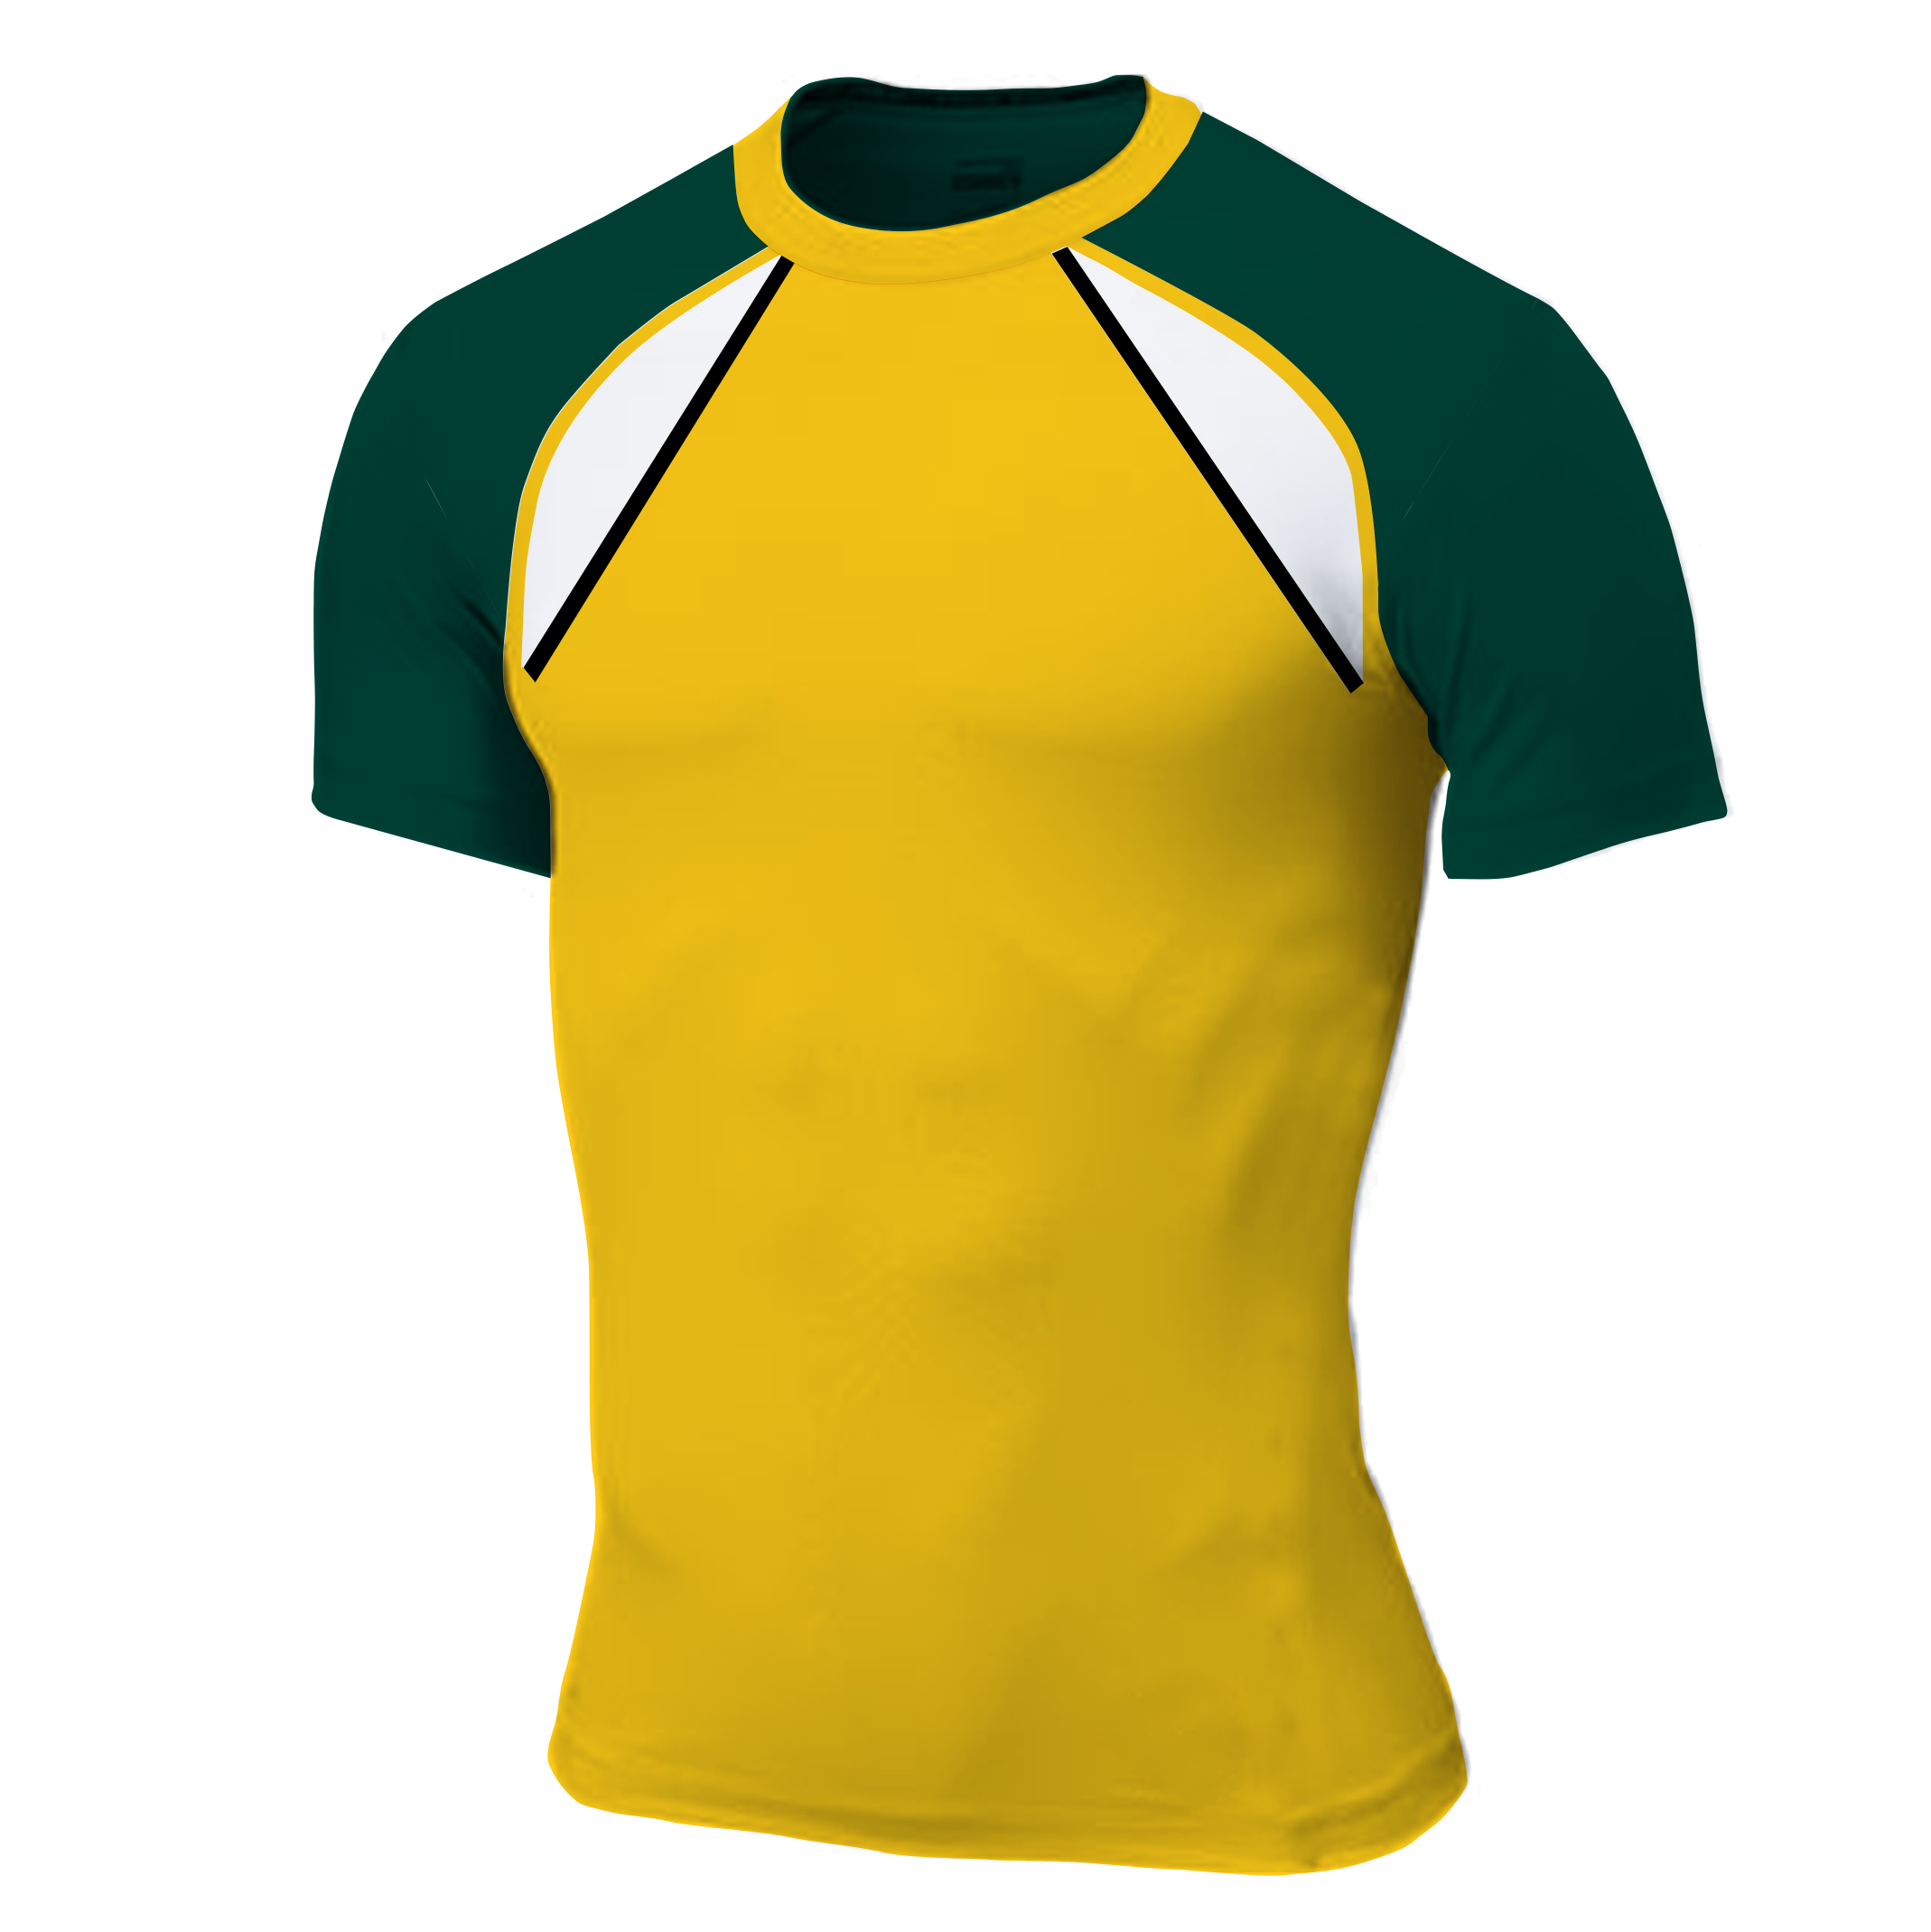 Panelled - T-shirt - Mick